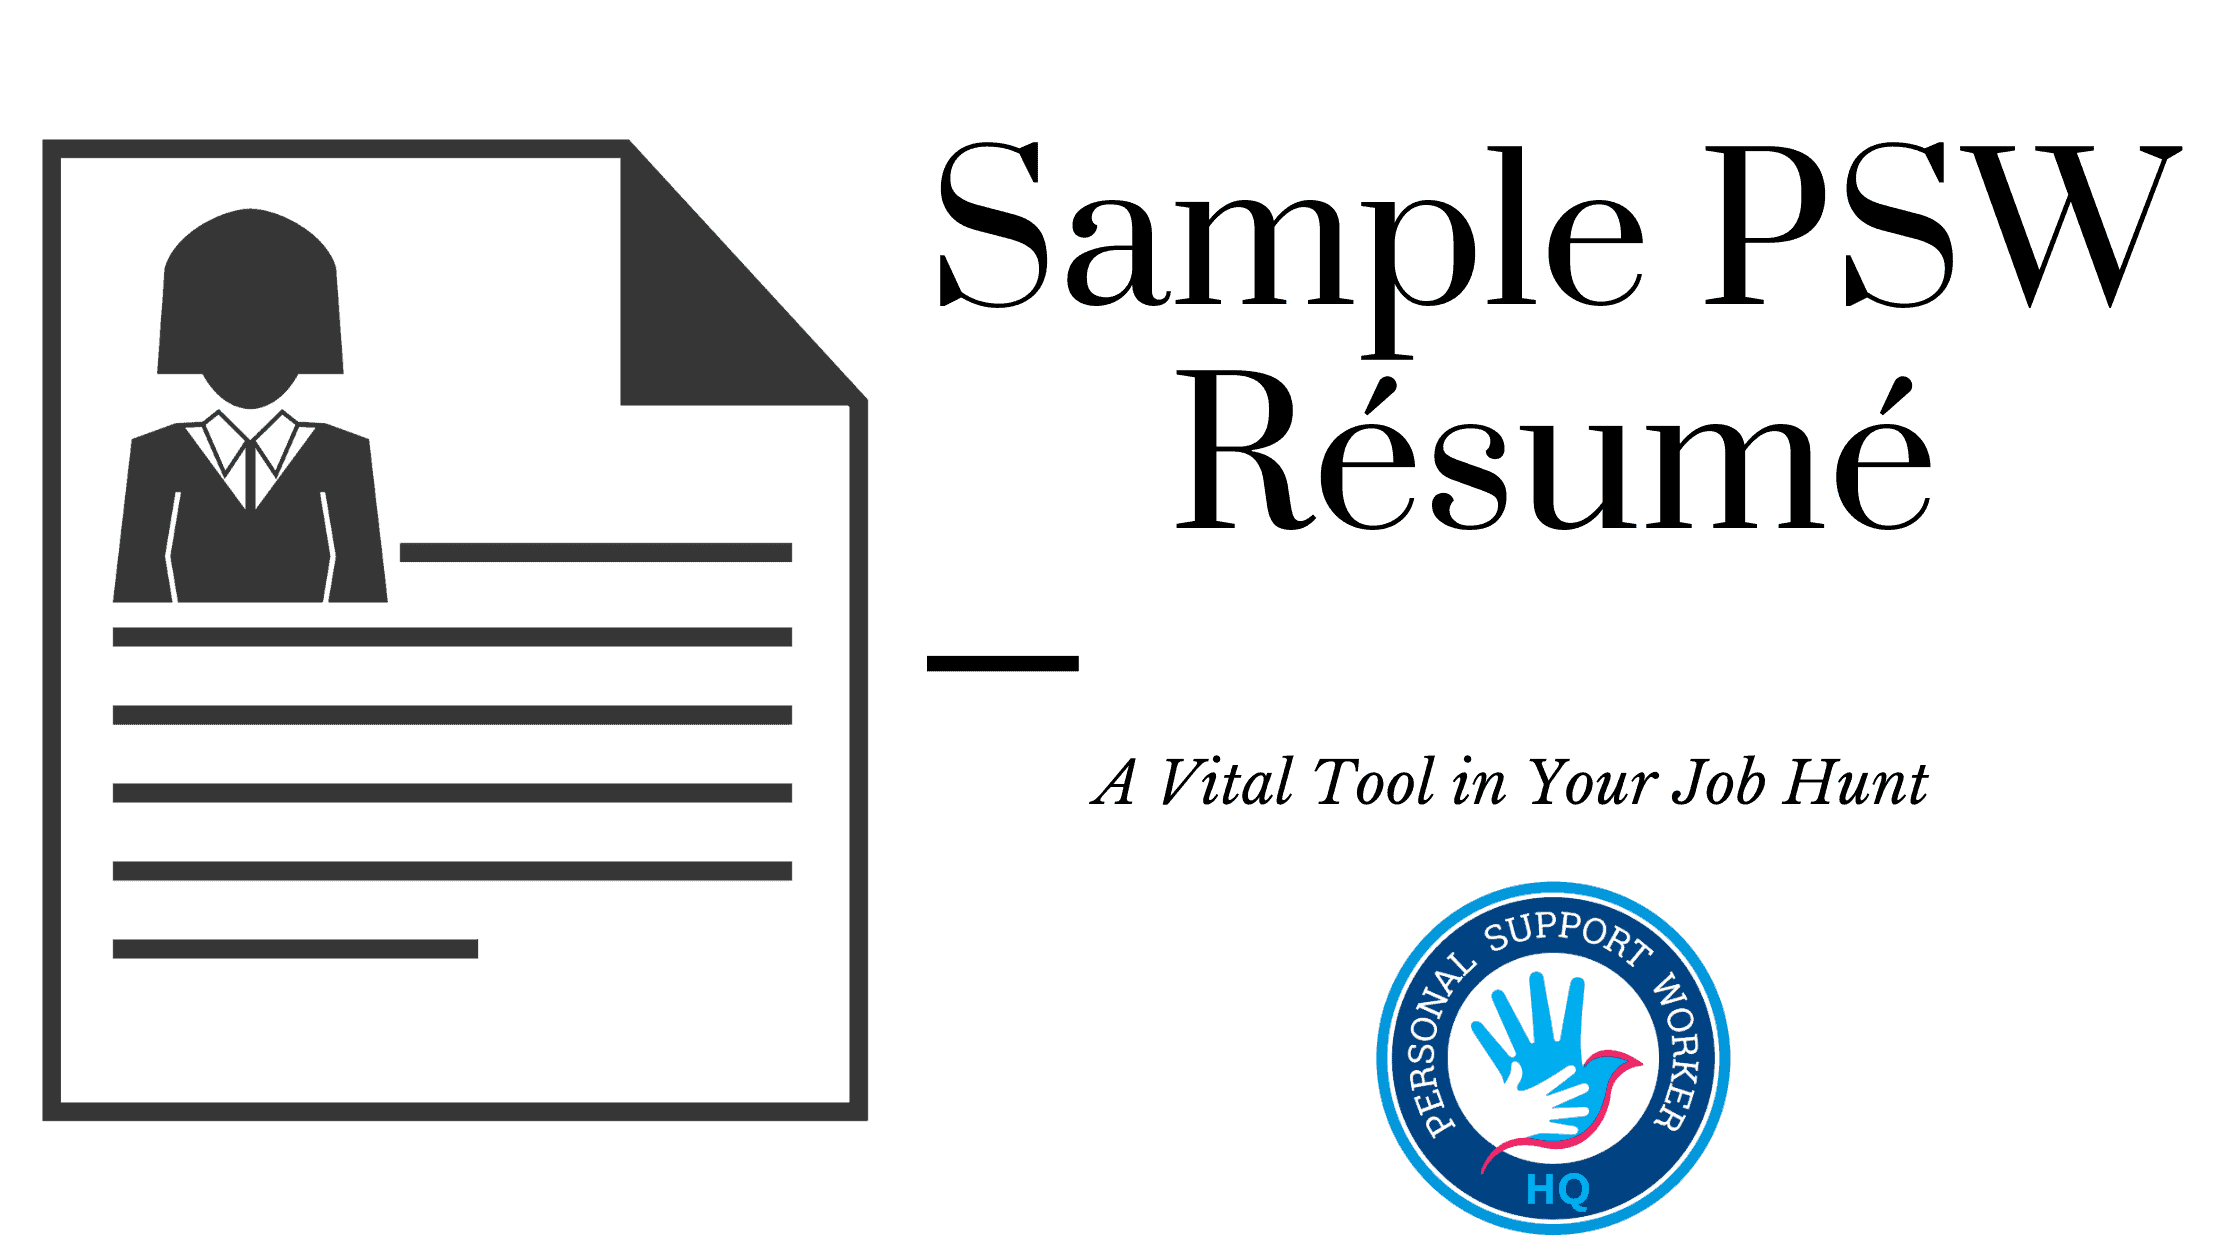 Sample Personal Support Worker Résumé